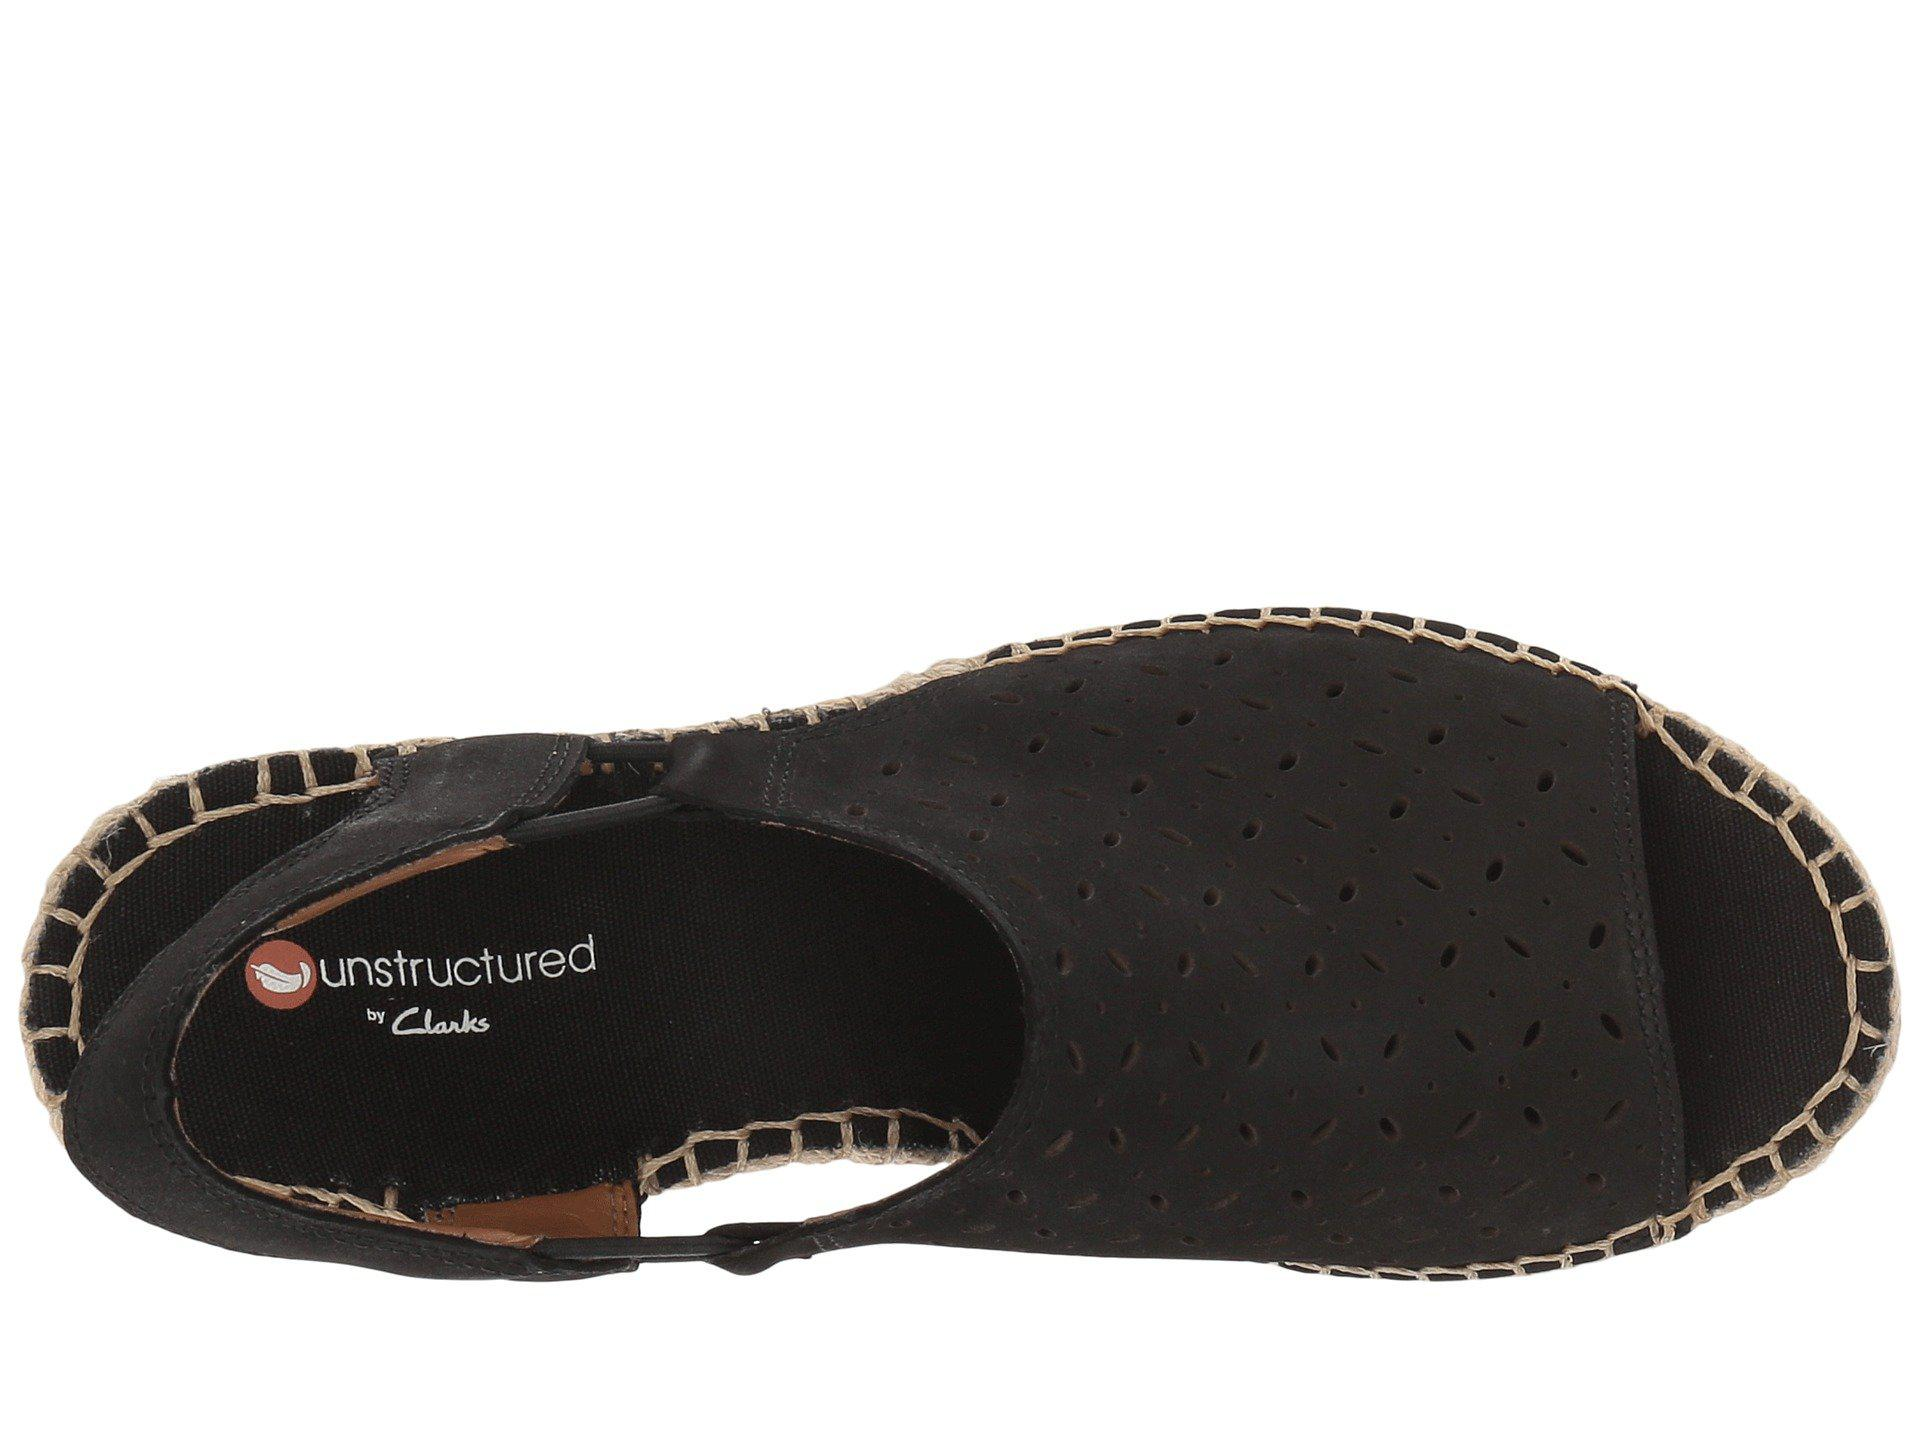 971dc96999e9 Clarks - Black Petrina Gail (gold Metallic Leather) Women s Shoes - Lyst.  View fullscreen